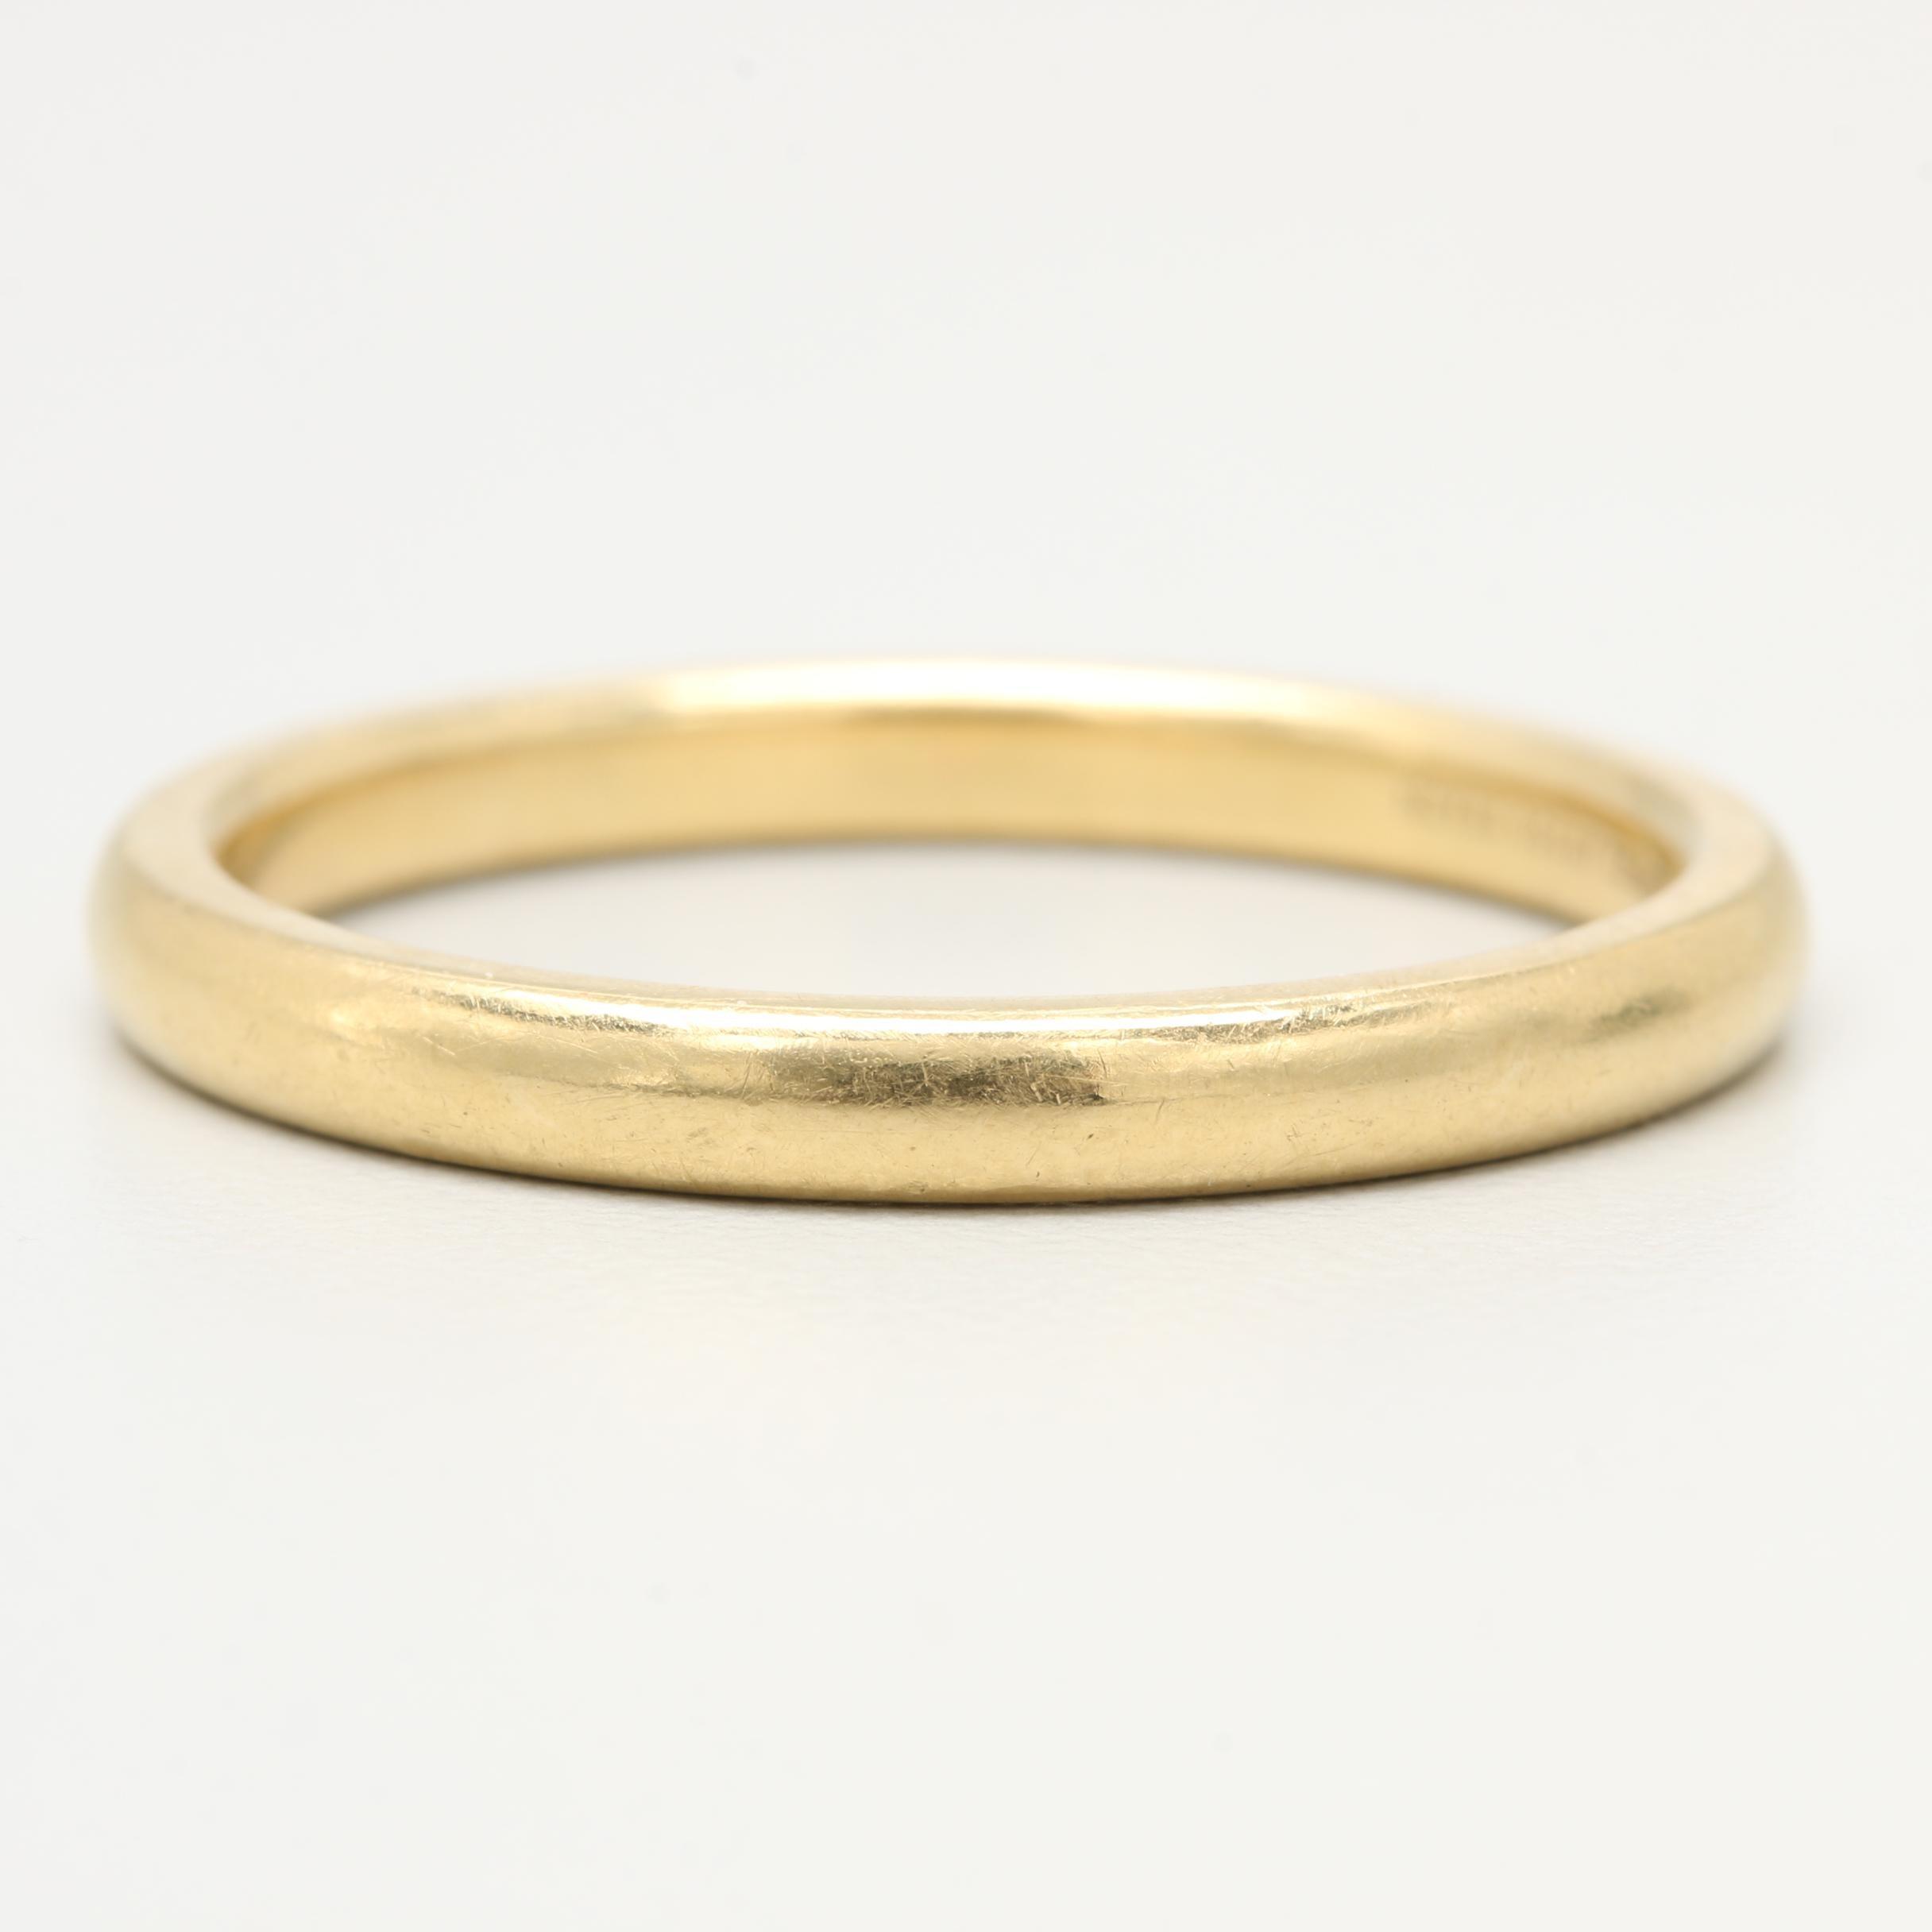 Elsa Peretti for Tiffany & Co. 18K Yellow Gold Ring